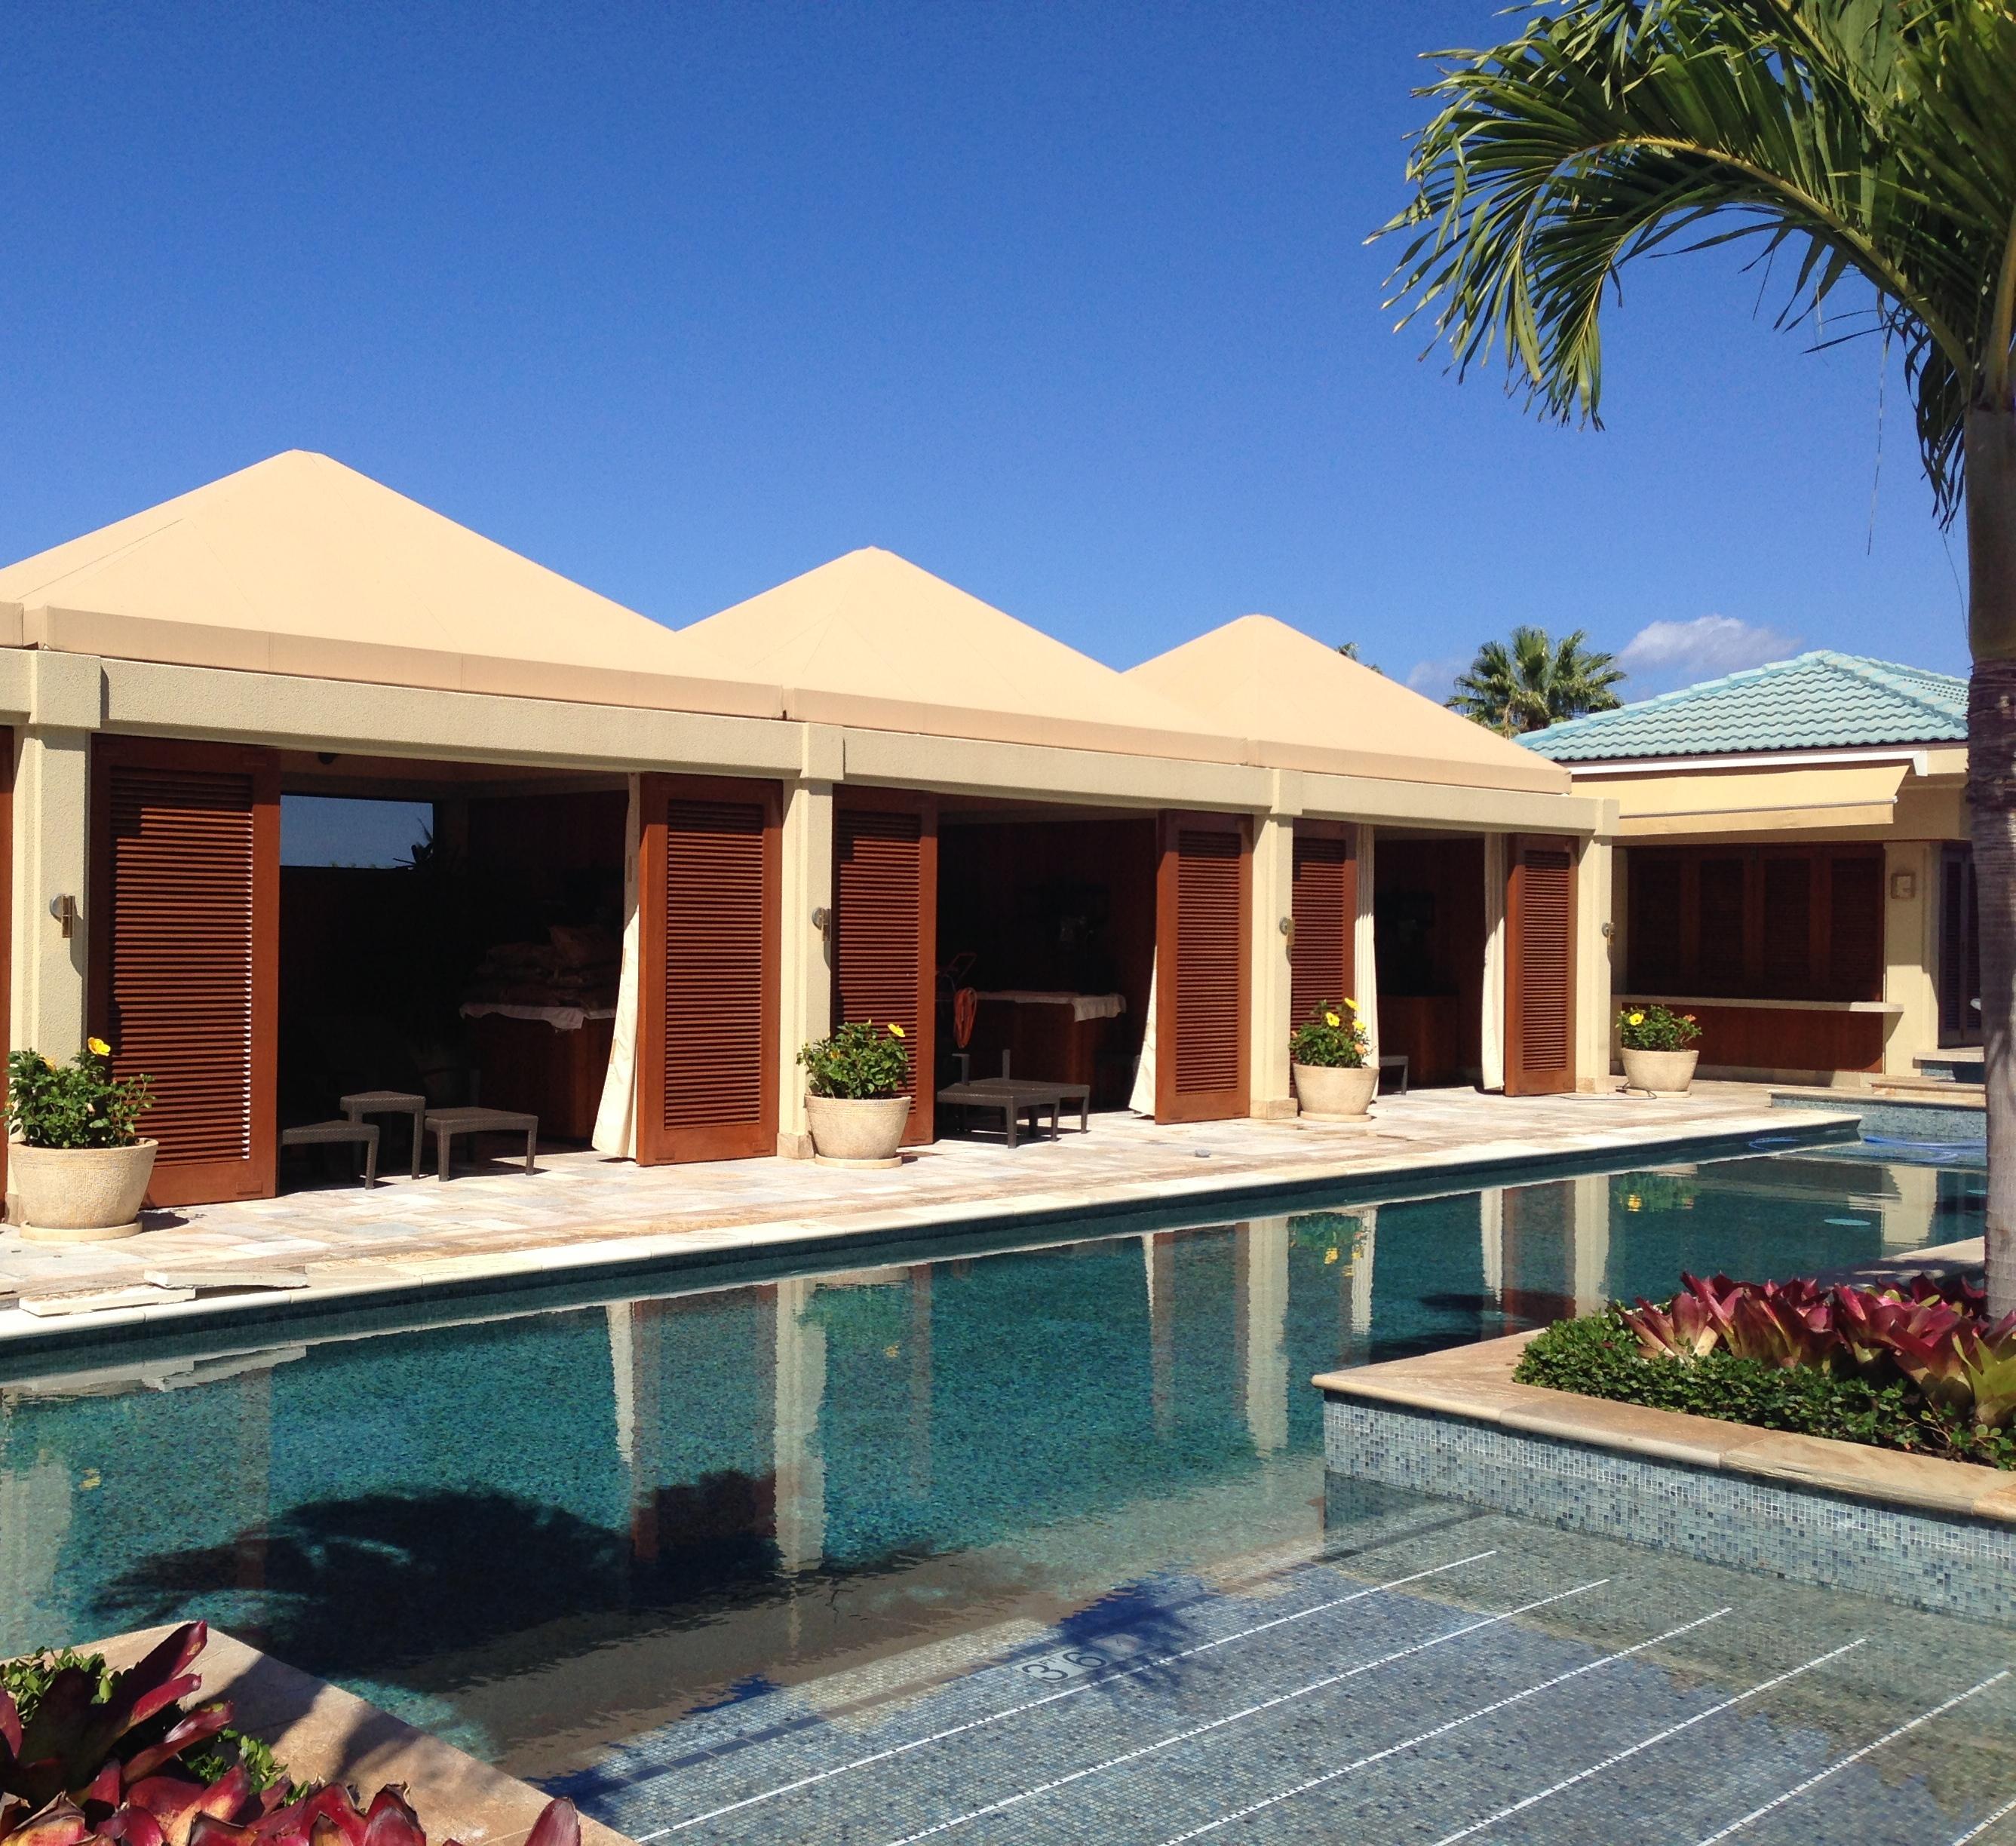 Four Seasons Maui Serenity Pool Cabanas